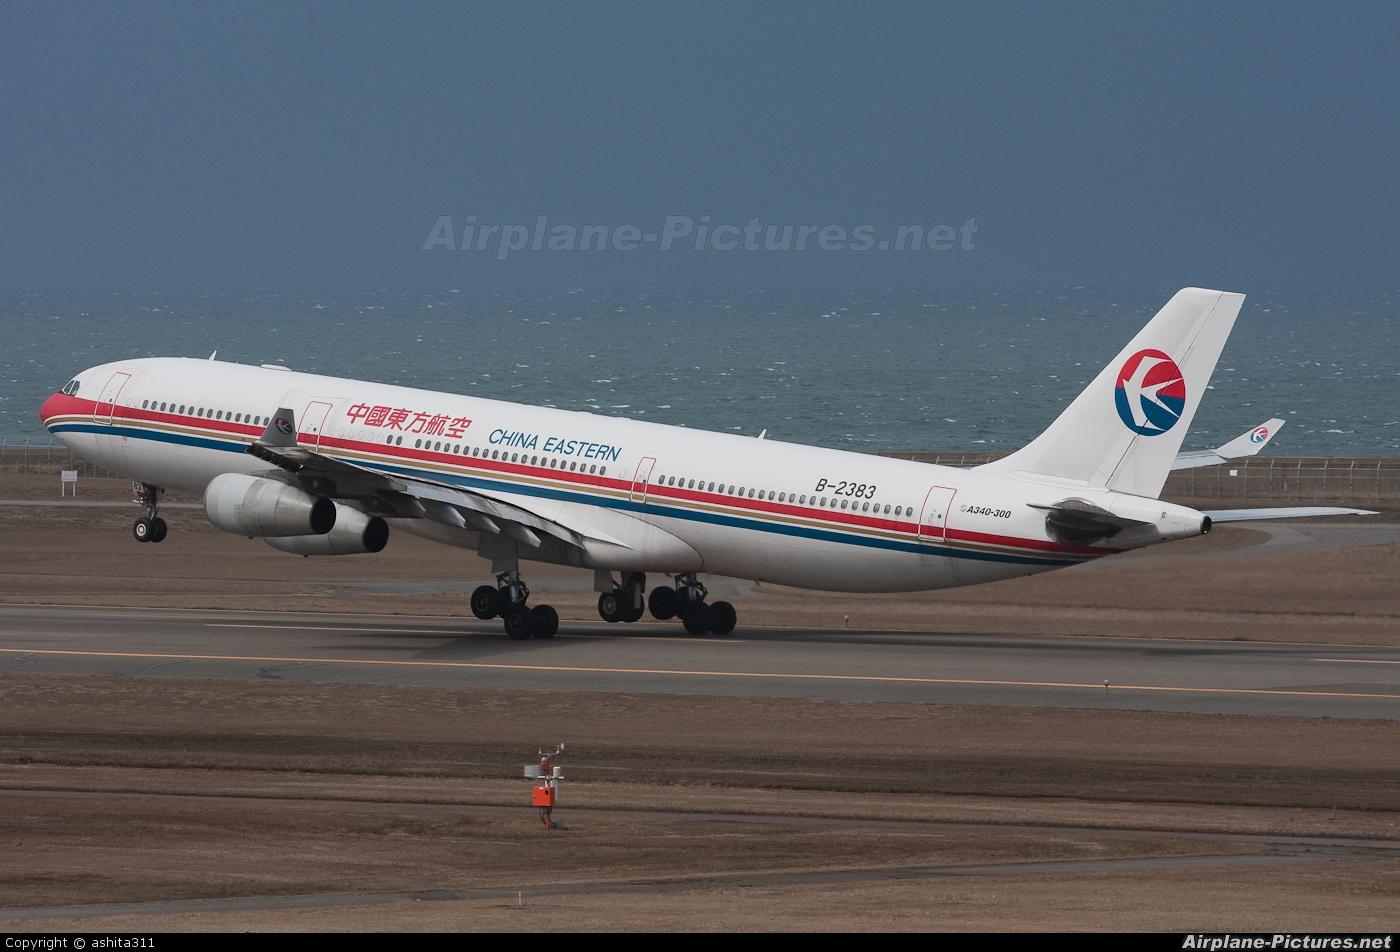 B 2383 china eastern airlines airbus a340 300 at niigata photo id 127550 airplane - China eastern airlines vietnam office ...